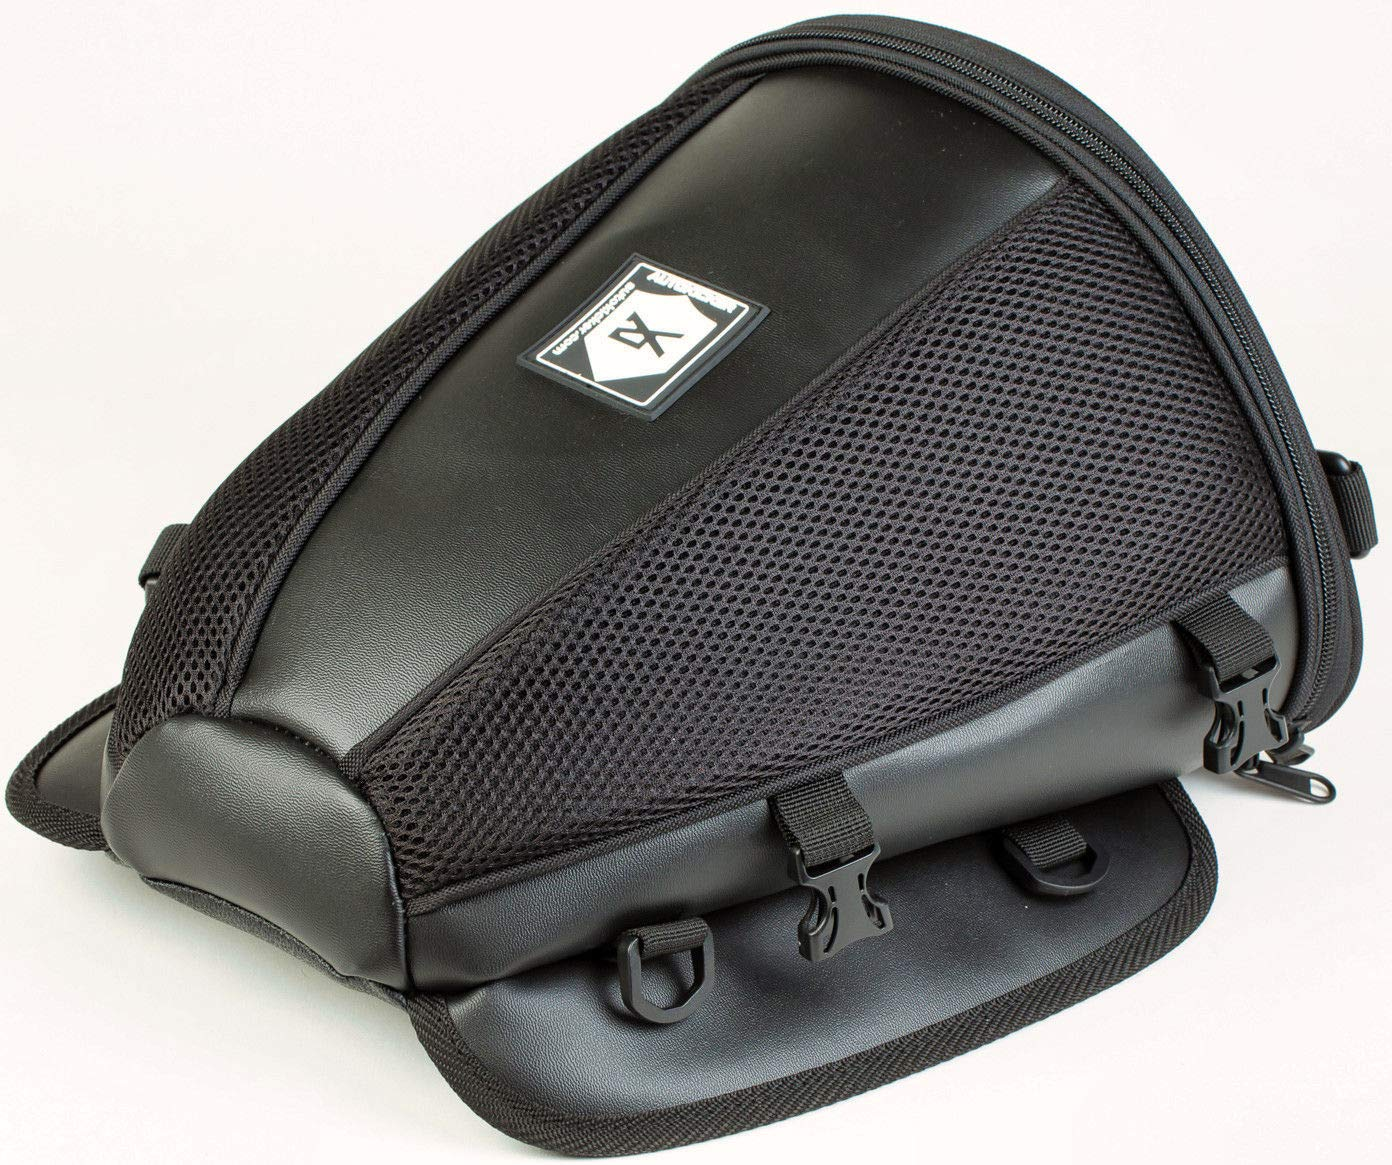 Autokicker® Hero Tail Pack/Seat Bag for Motorcycles & Motorbikes